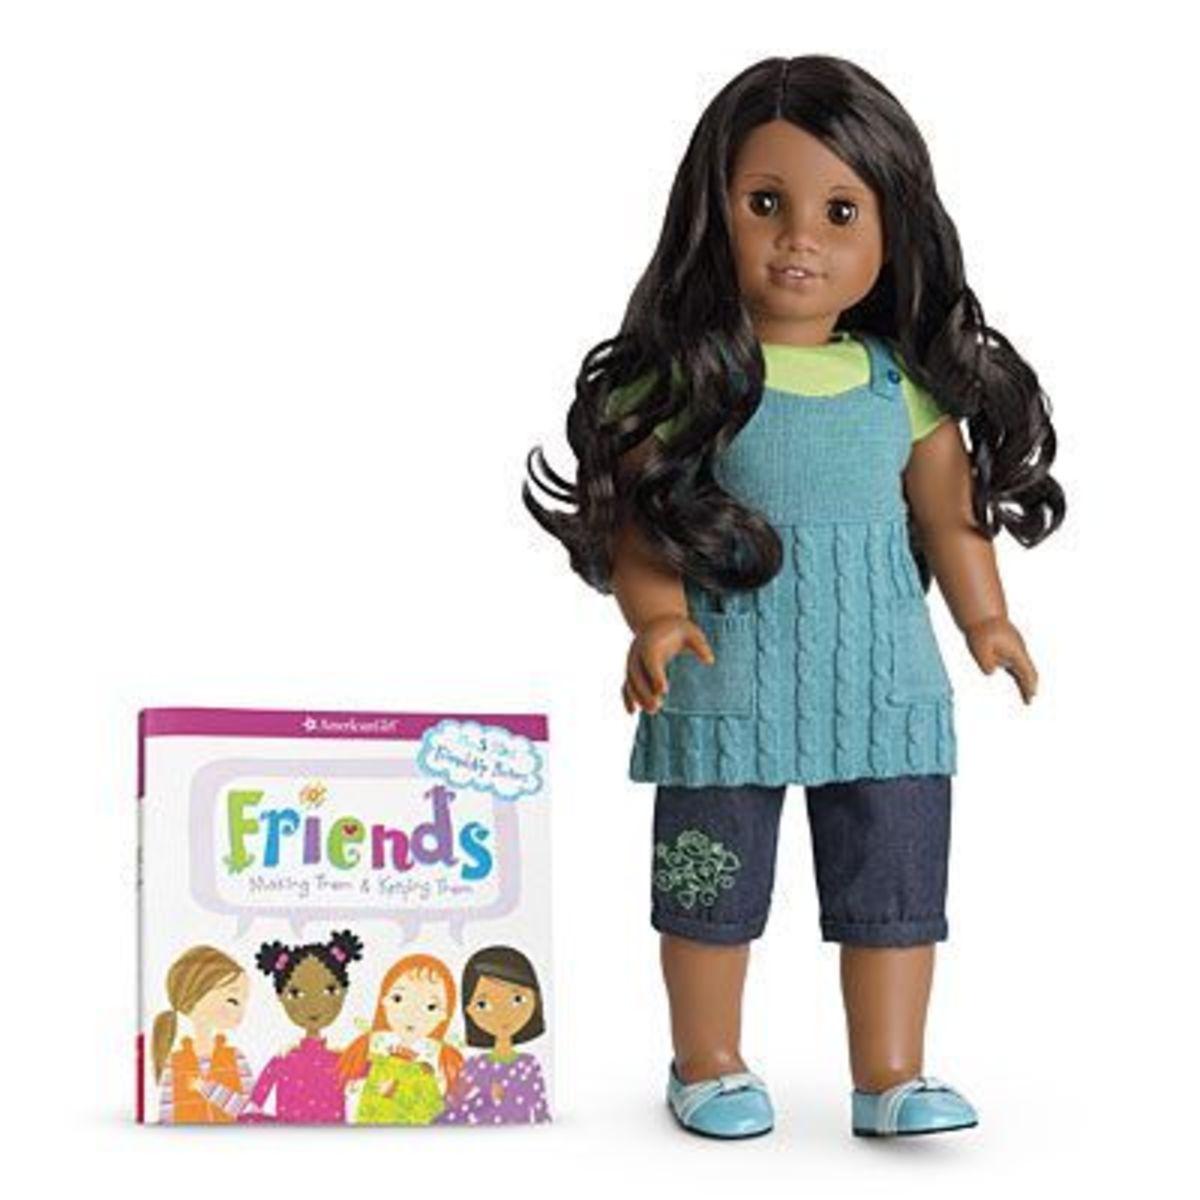 Sonali, Chrissa's other companion doll